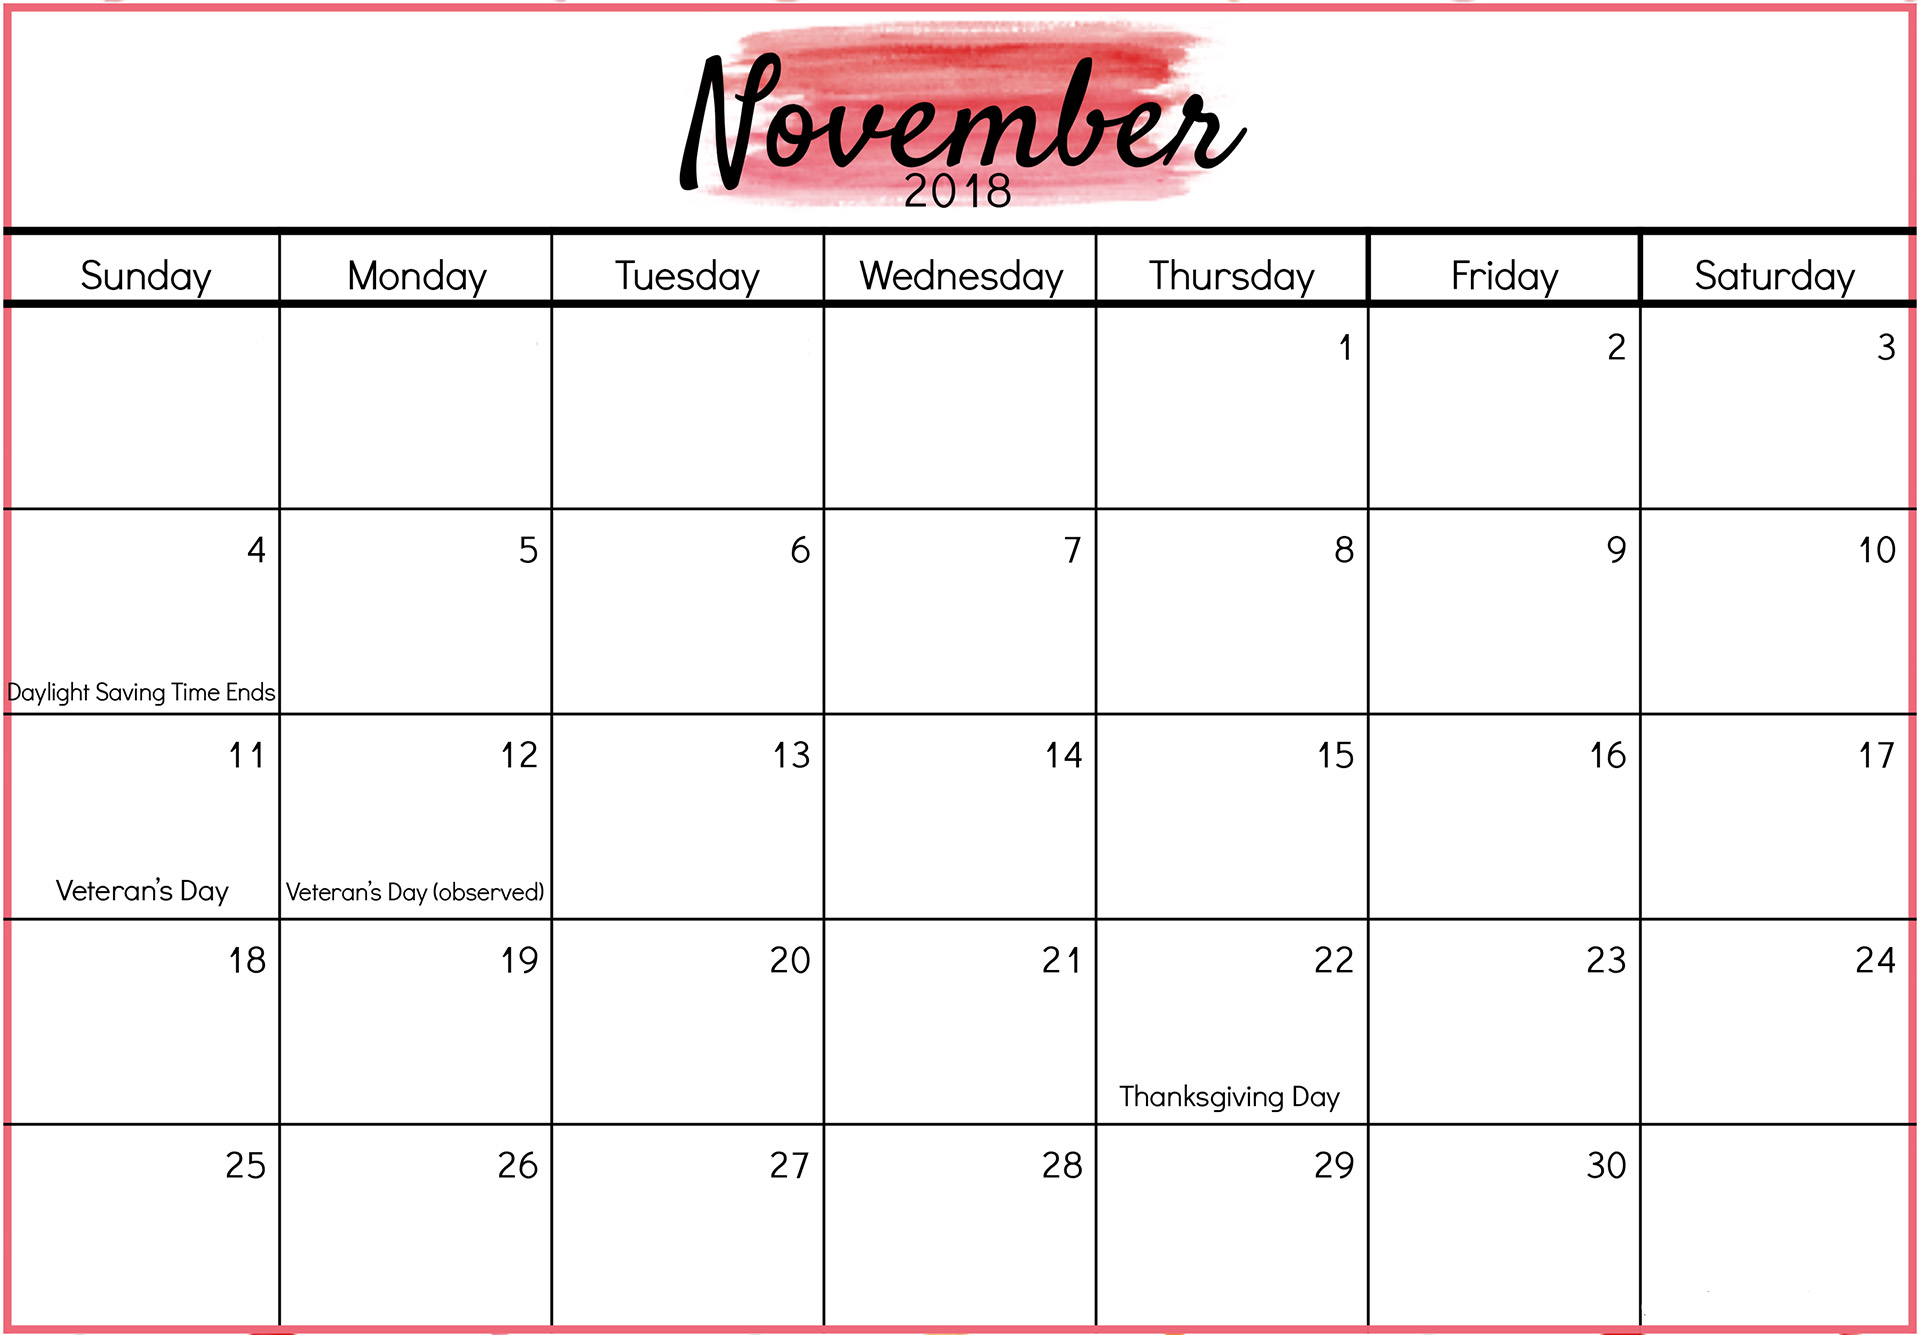 Print November 2018 Calendar